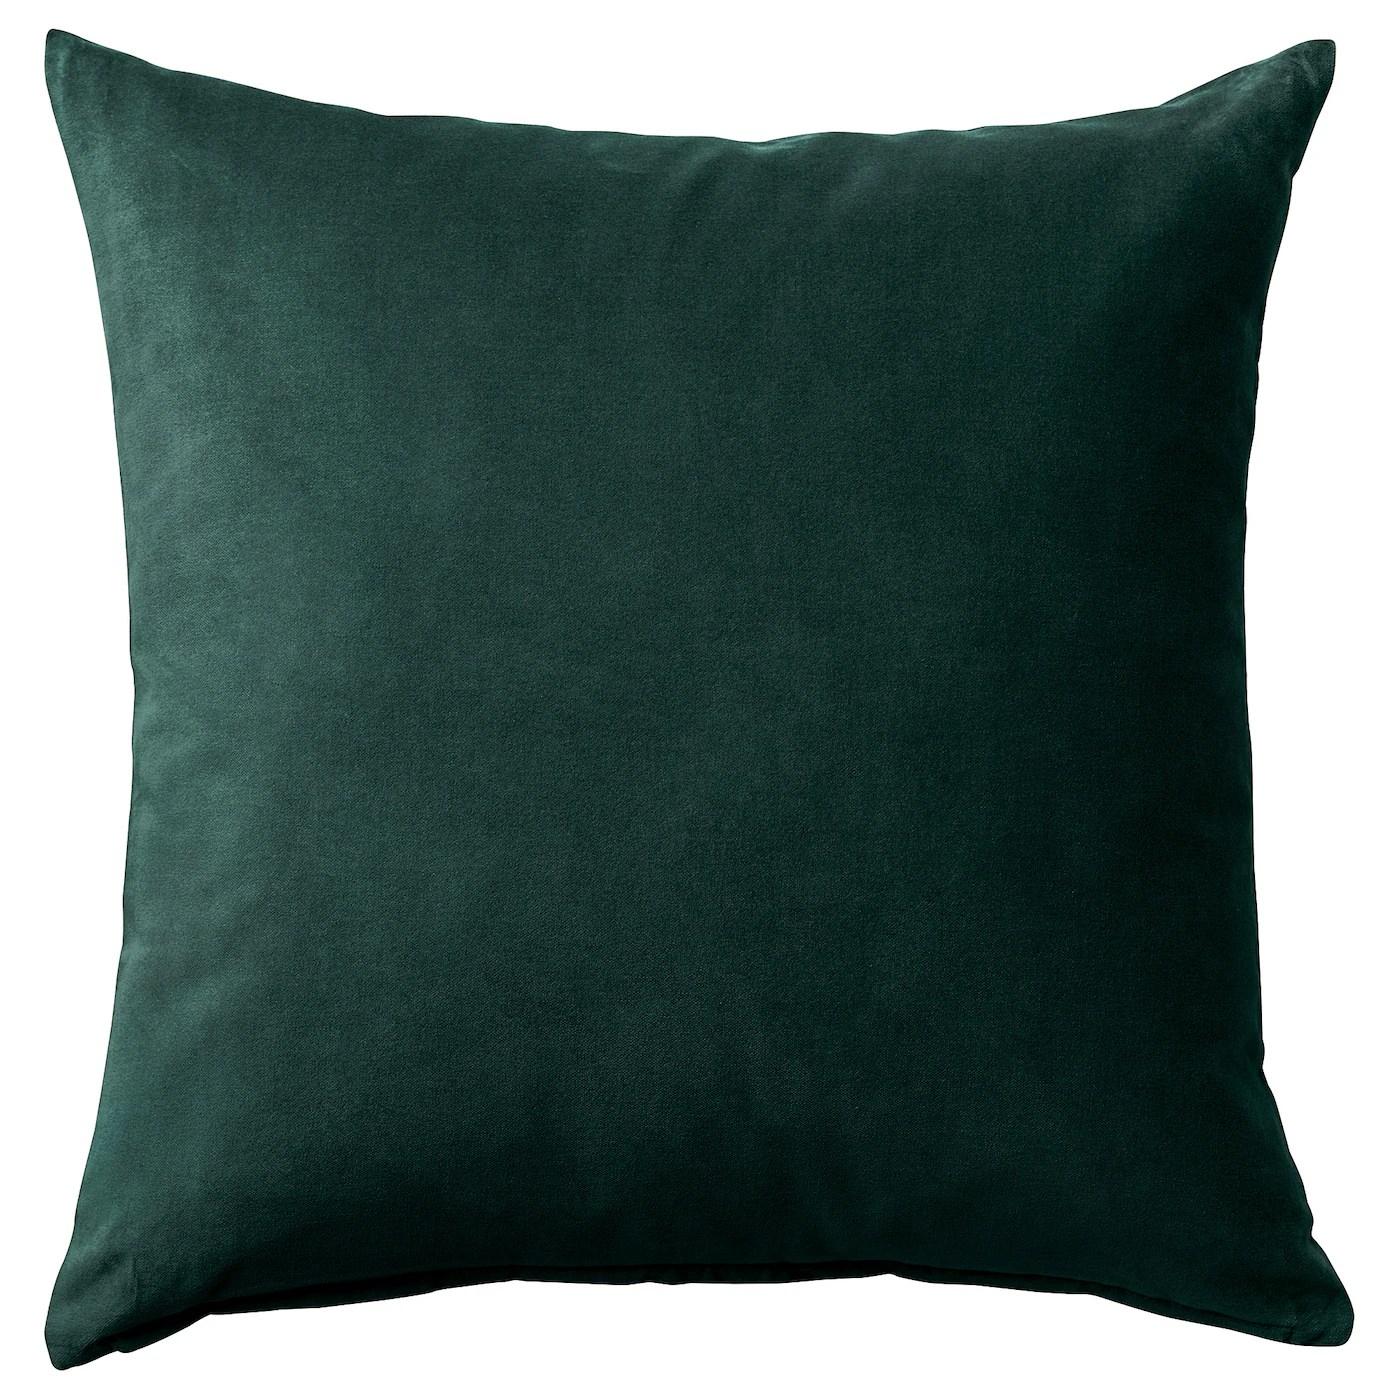 sanela cushion cover dark green 20x20